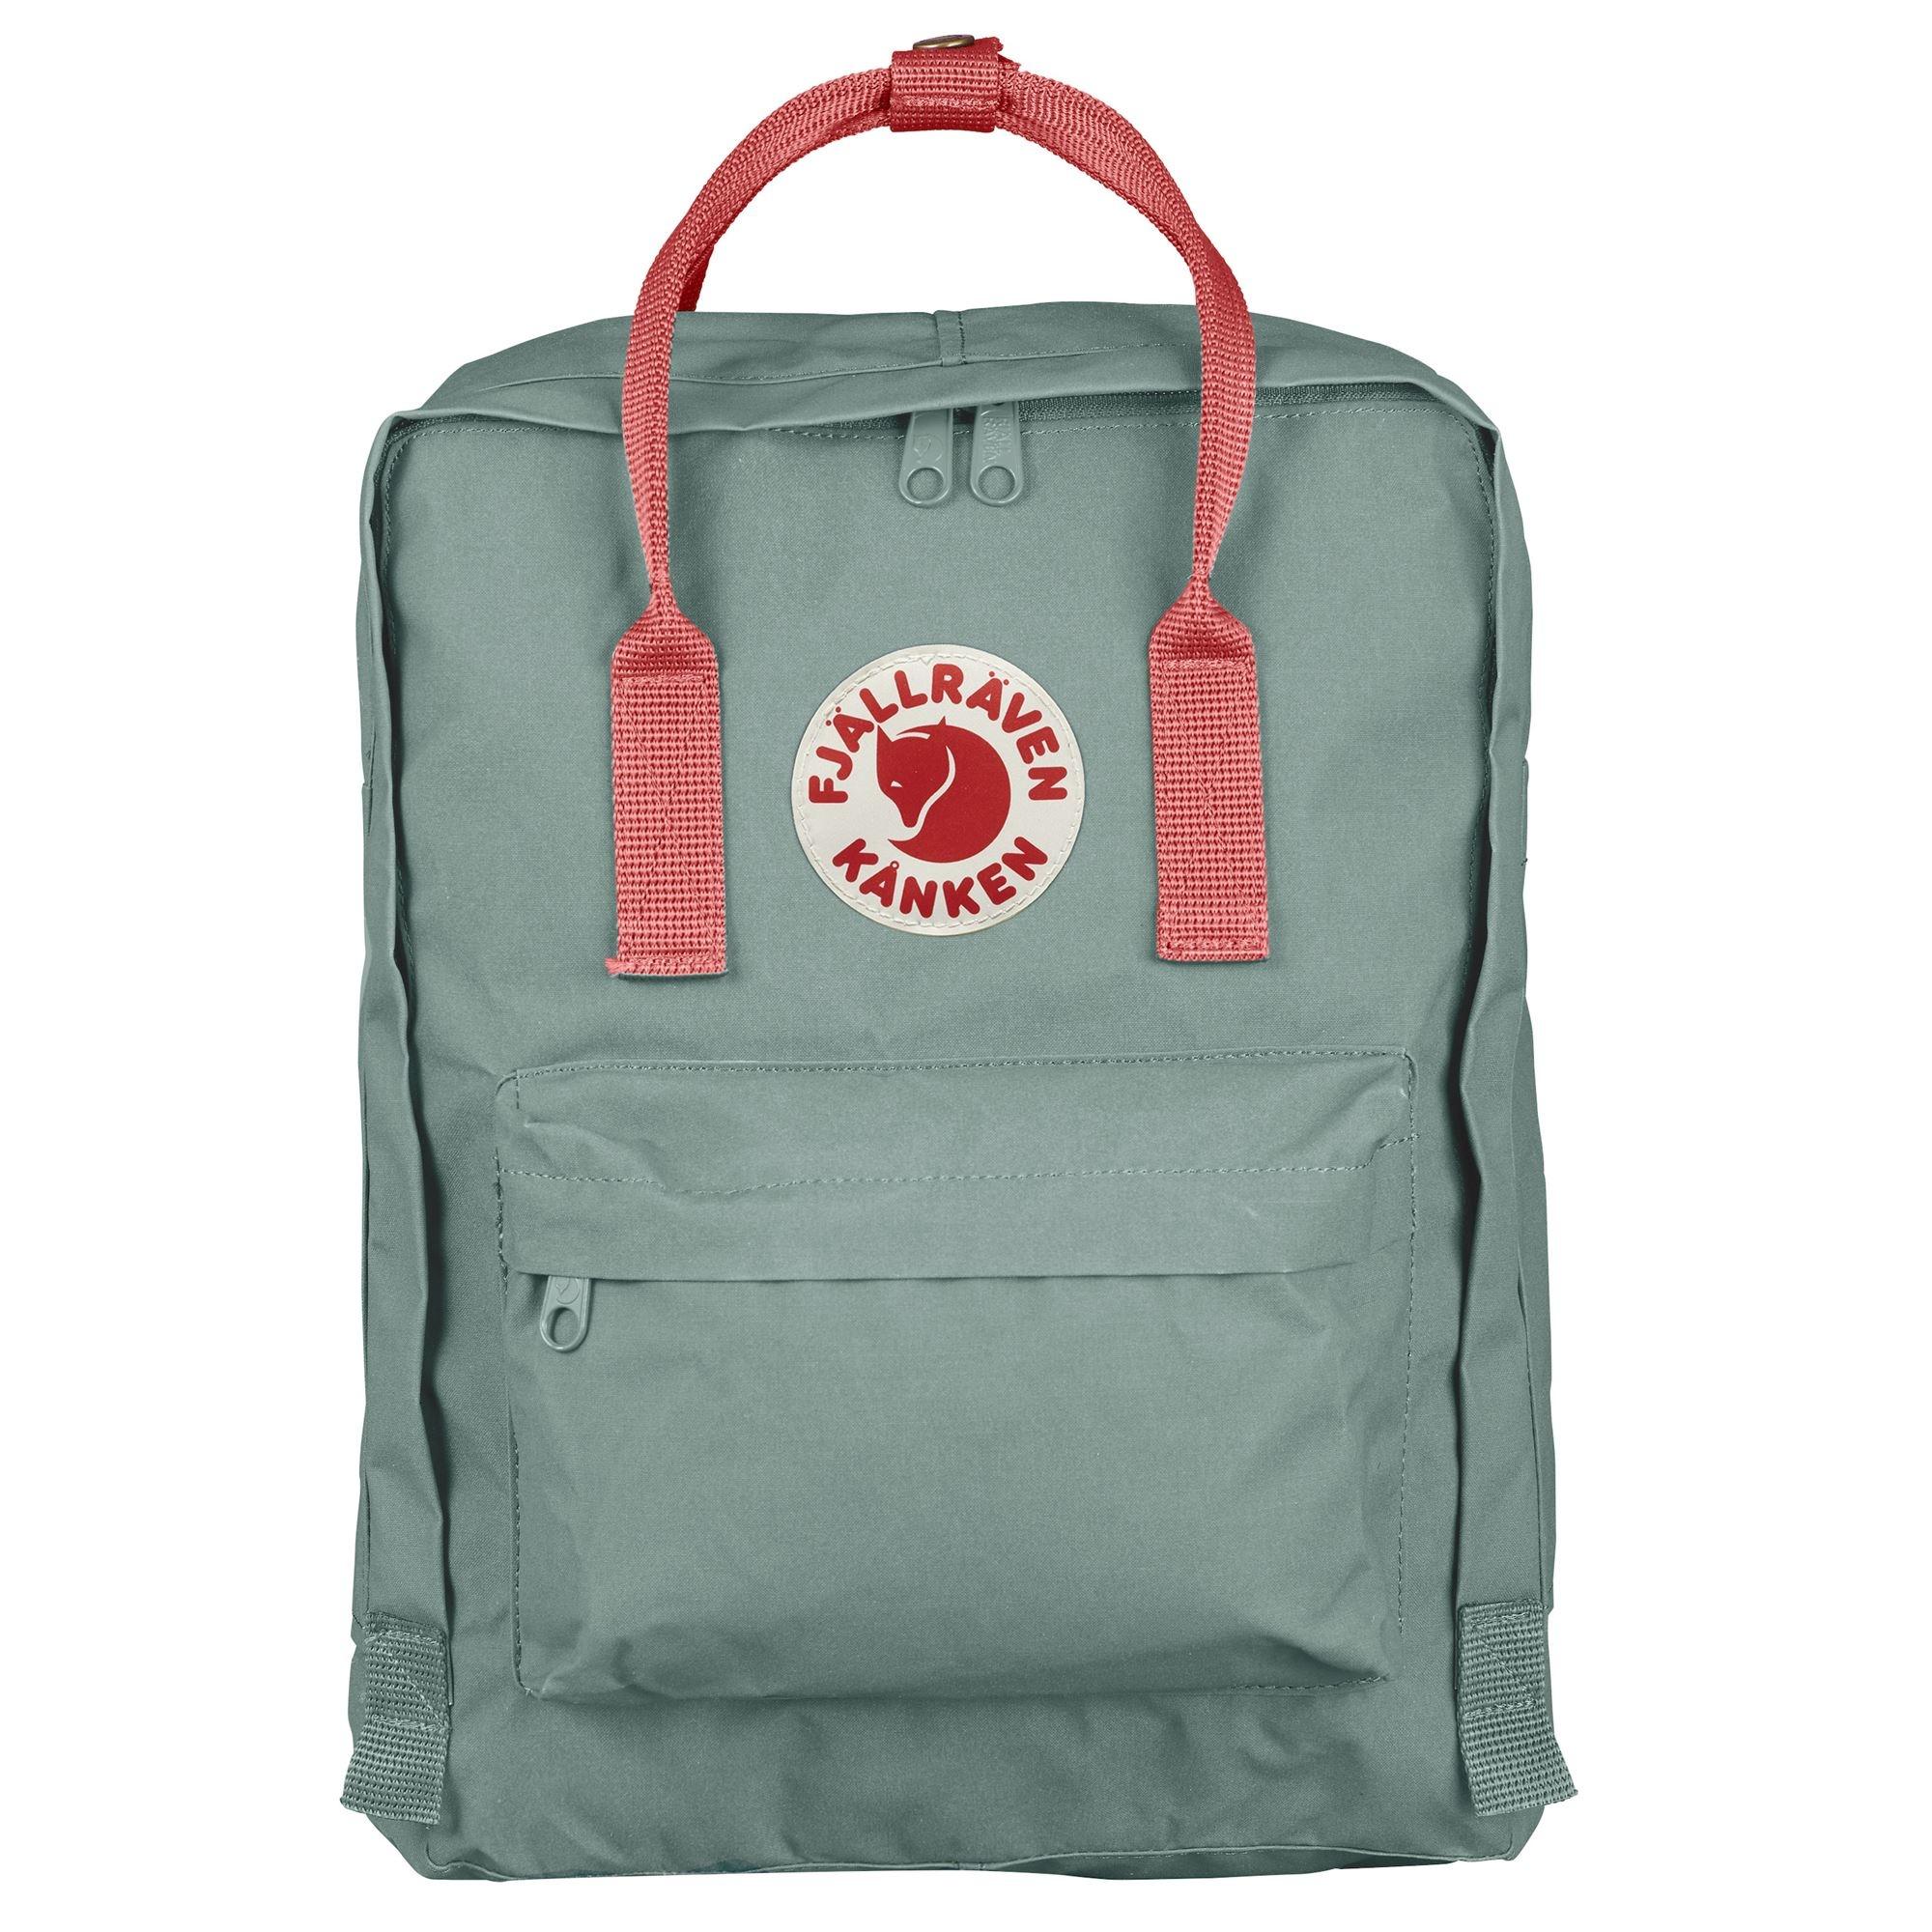 Fjallraven Kanken Classic Backpack - Frost Green-Peach Pink